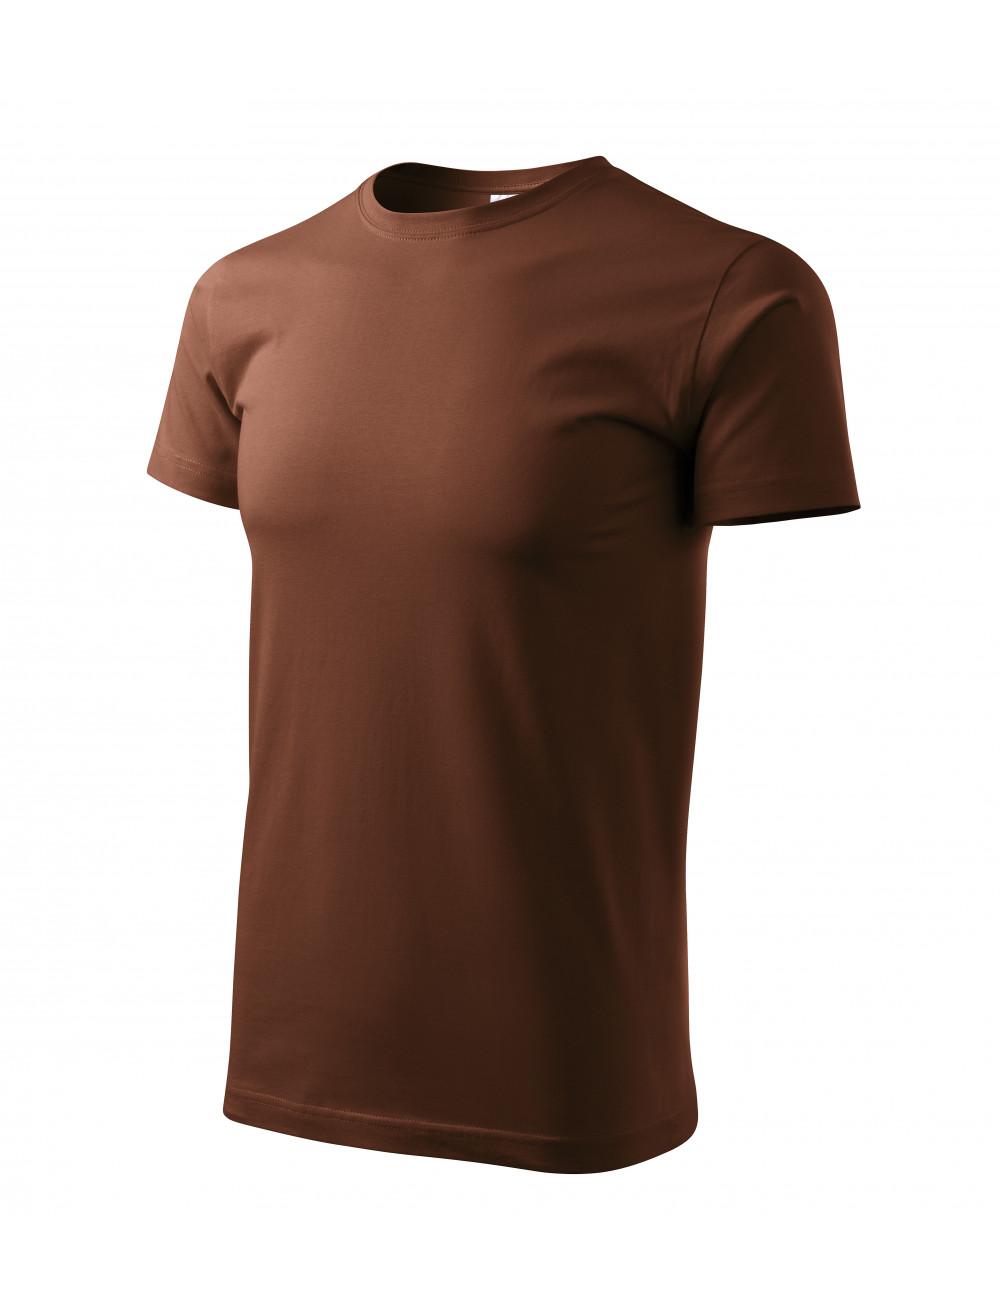 Adler MALFINI Koszulka męska Basic 129 czekoladowy